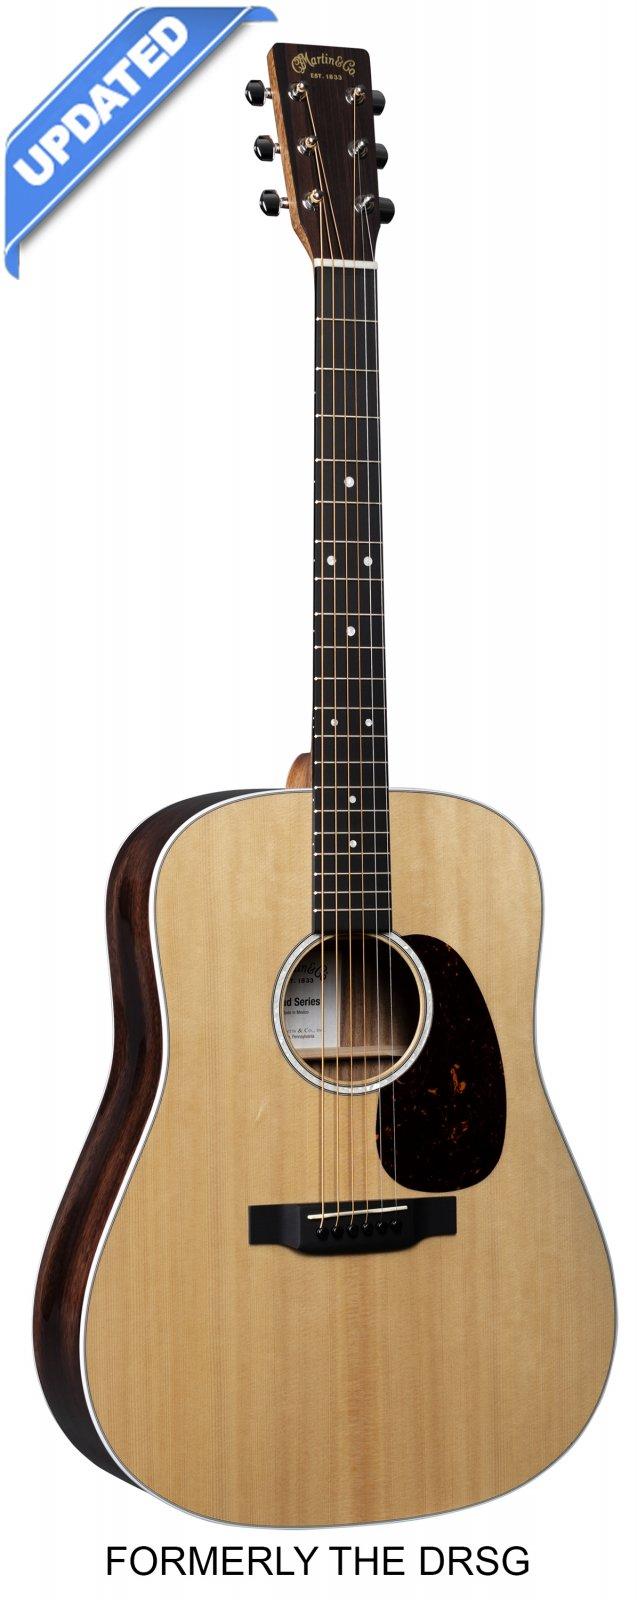 Martin D-13E Road Series Acoustic-Electric Guitar - Natural